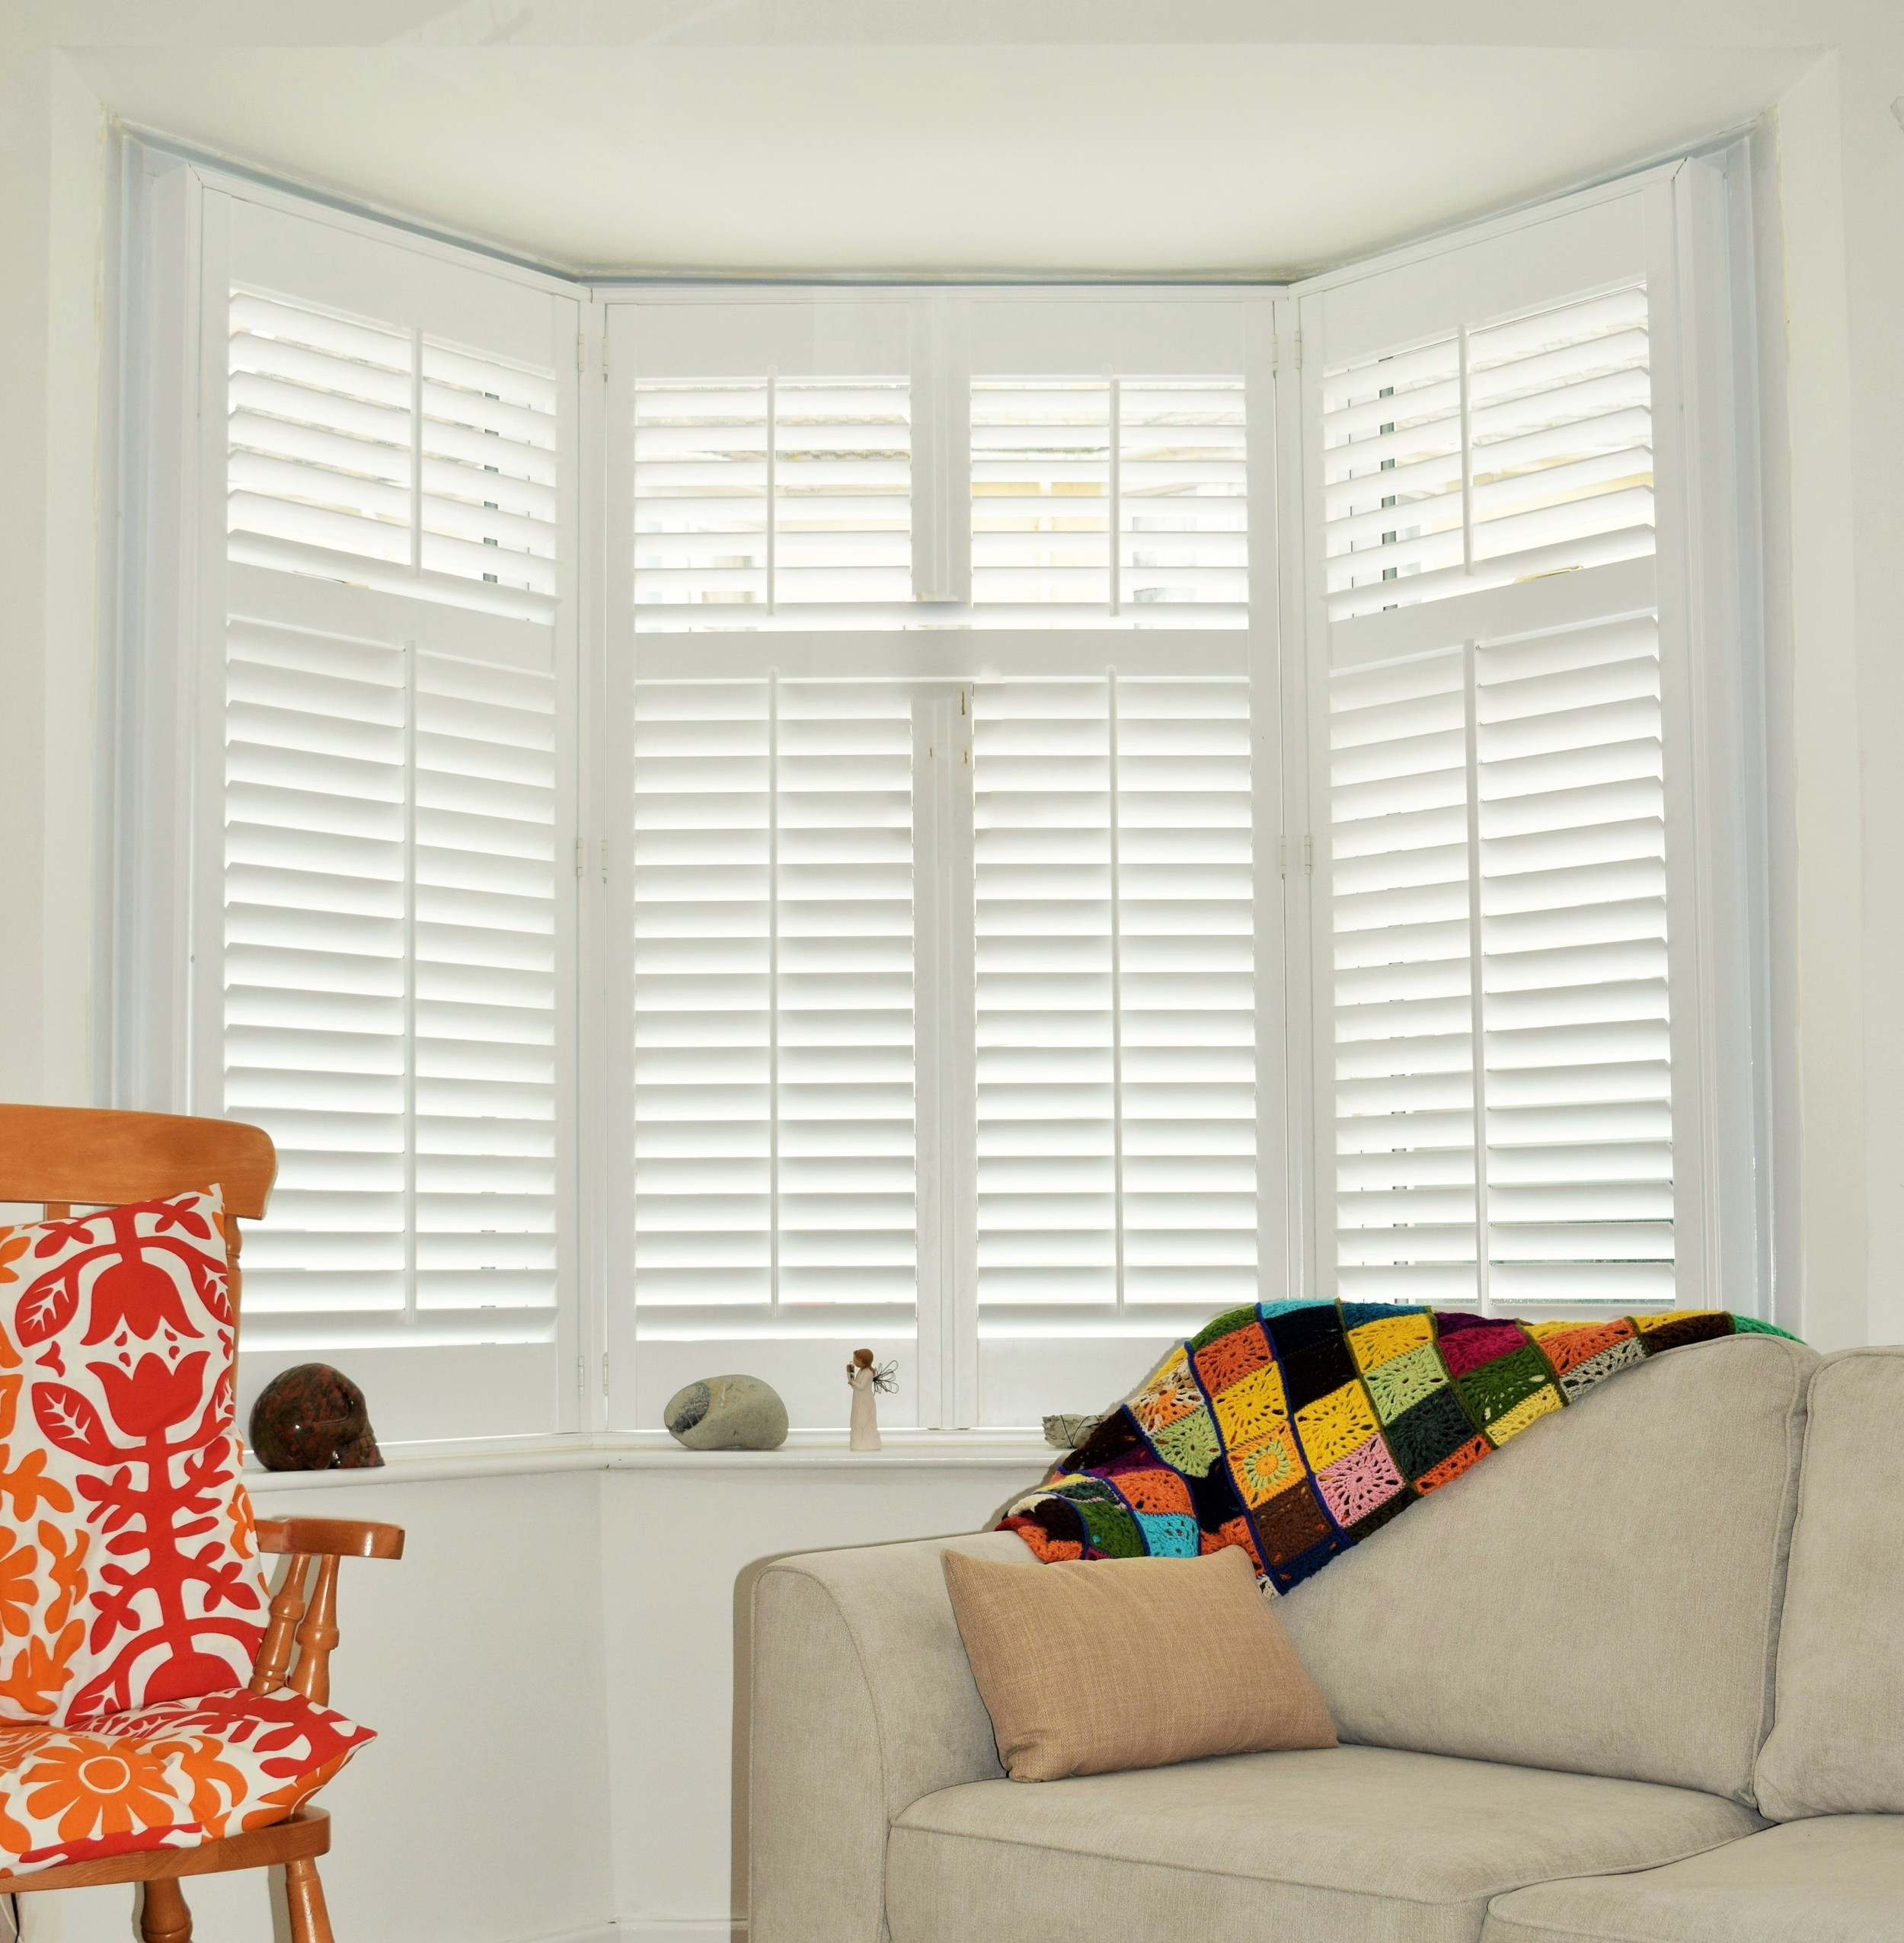 Bay window plantation shutters Weymouth Dorset